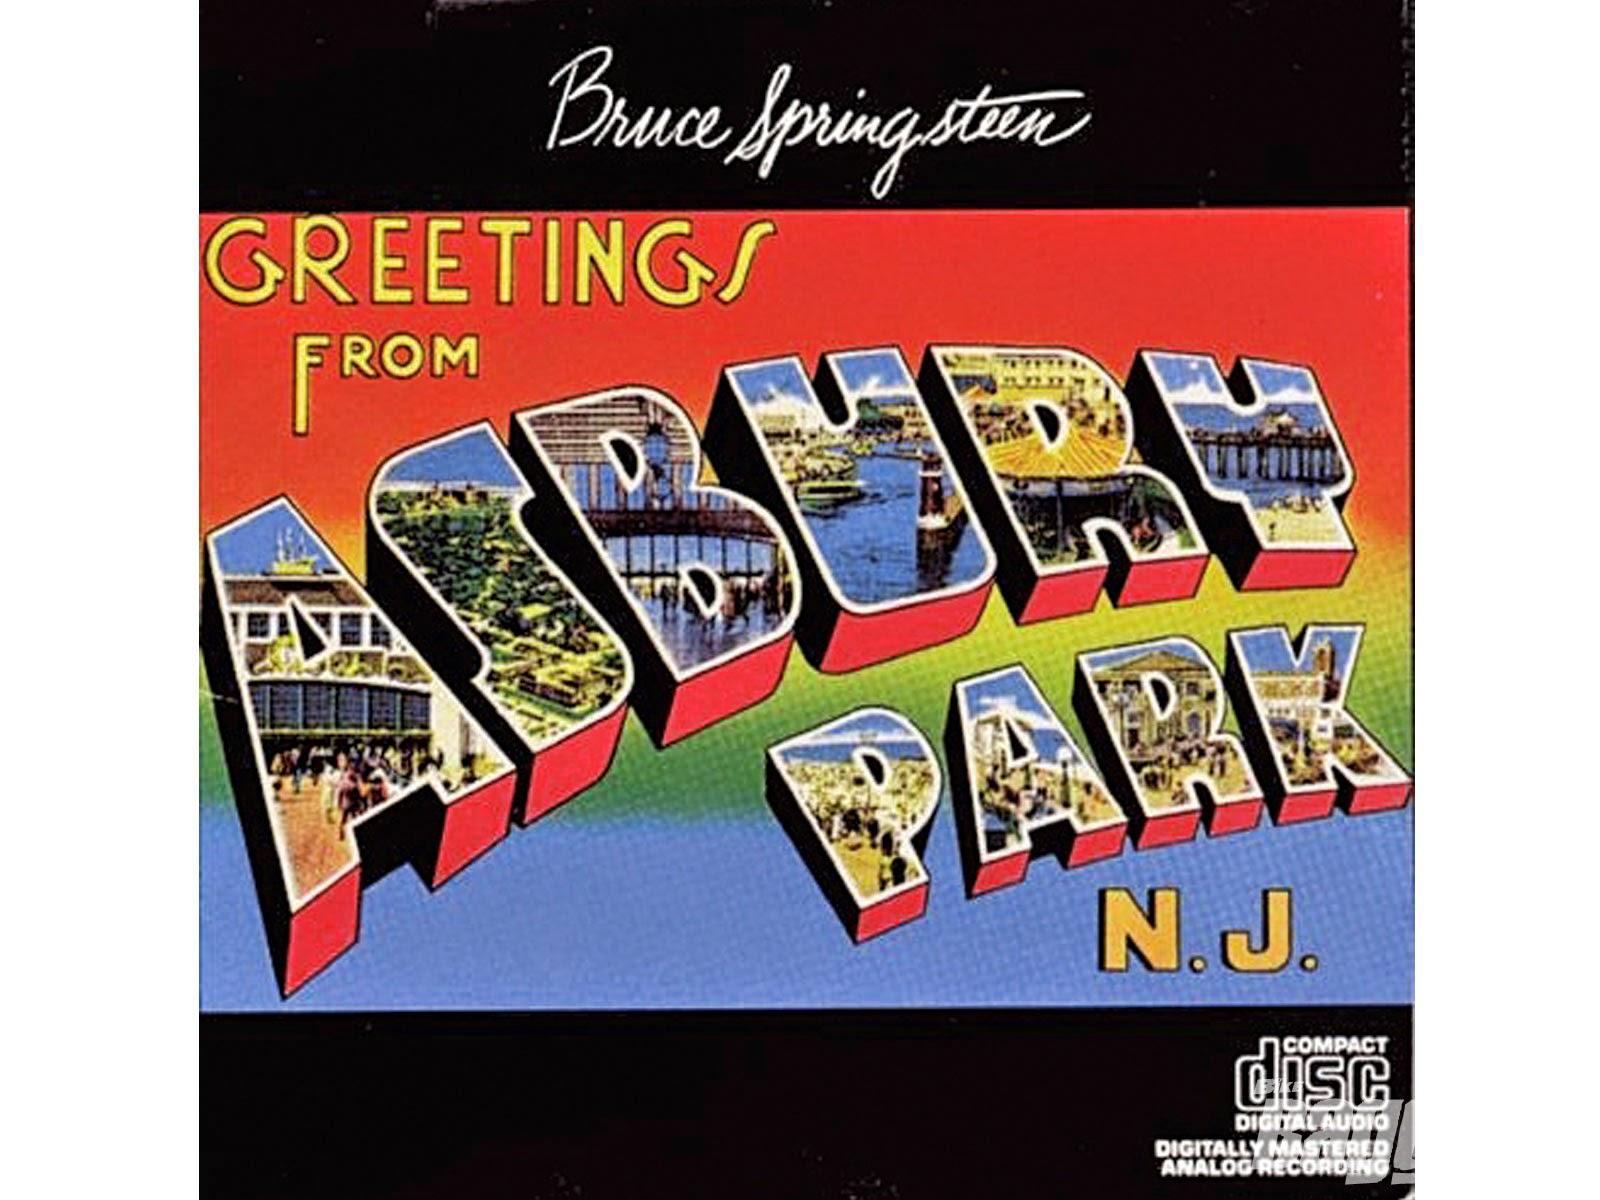 Asbury Park Bruce Springsteen Tour